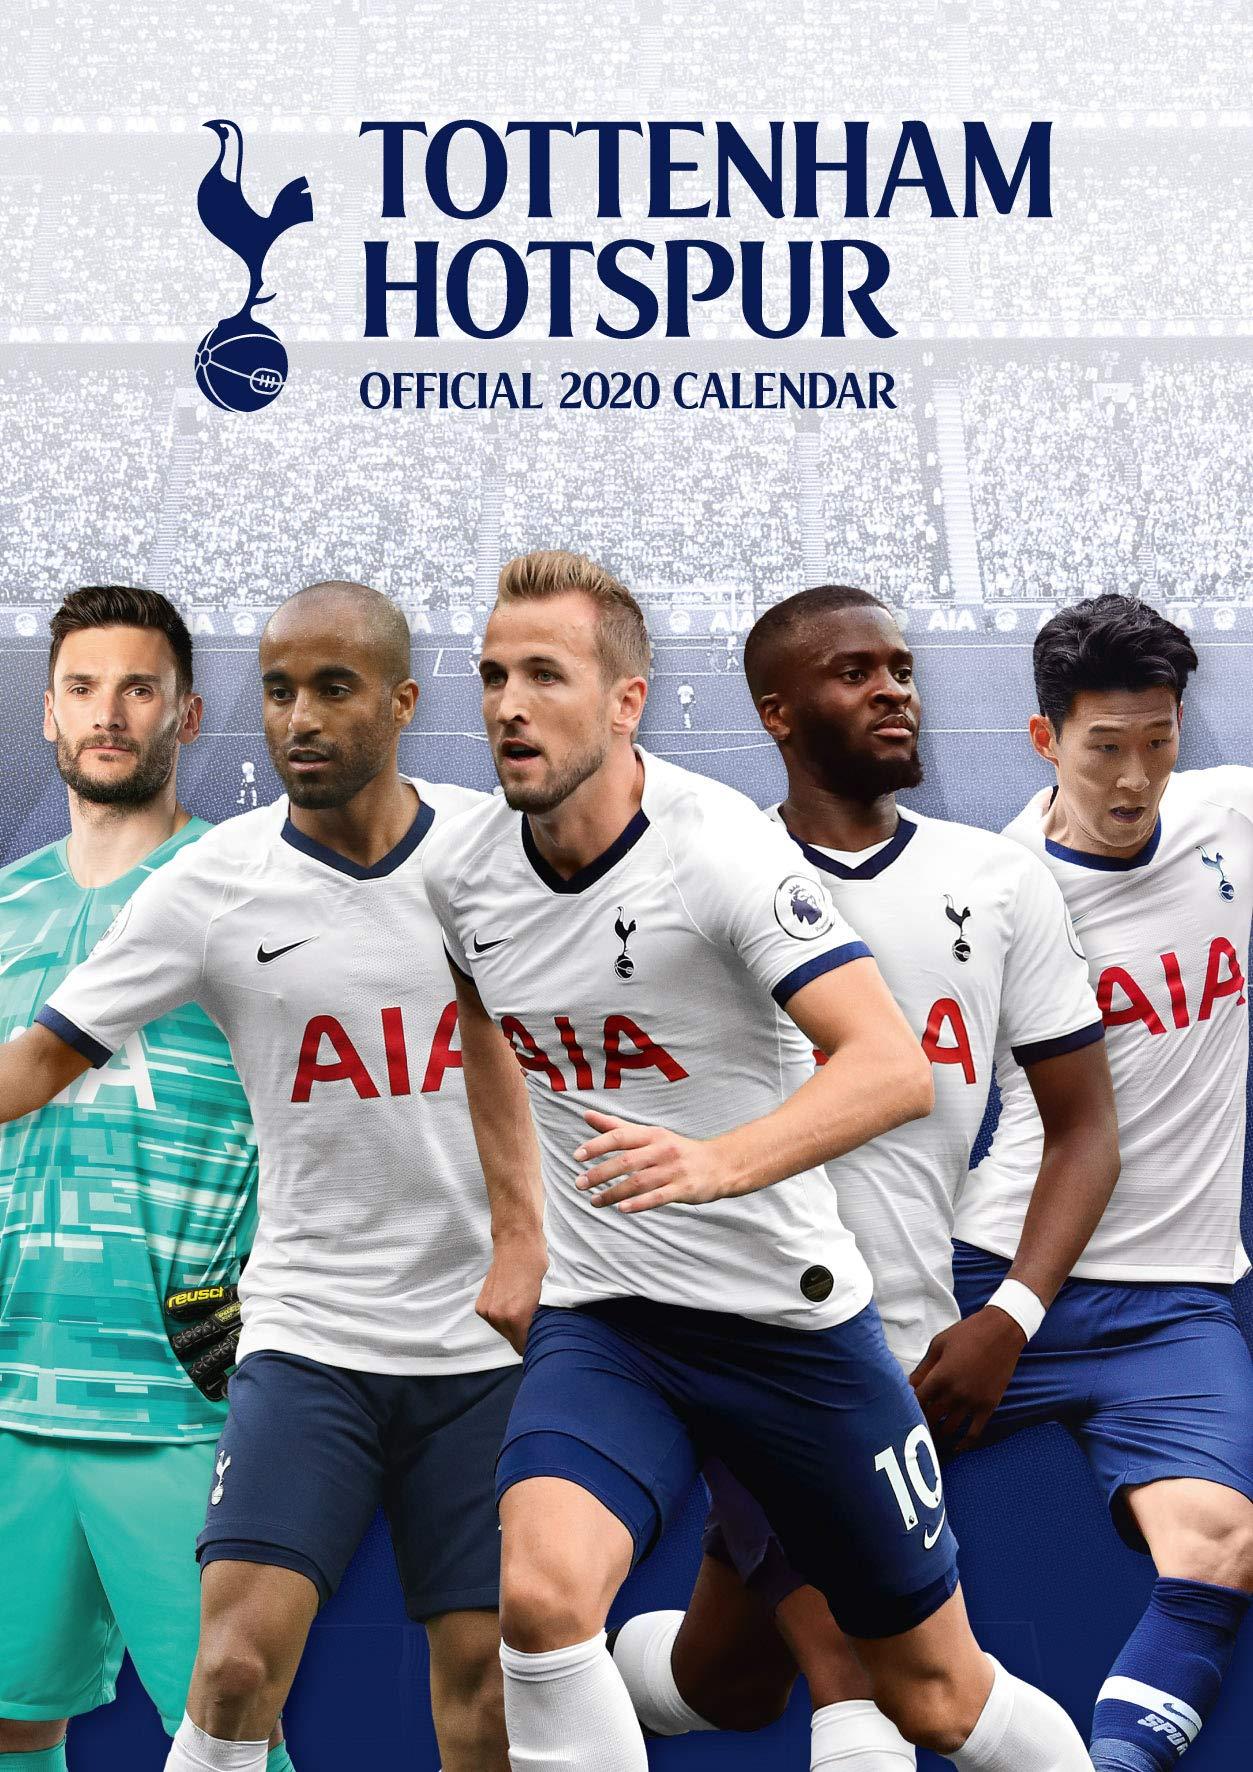 The Official Tottenham Hotspur F C Calendar 2020 Hotspur Tottenham 9781838541866 Amazon Com Books